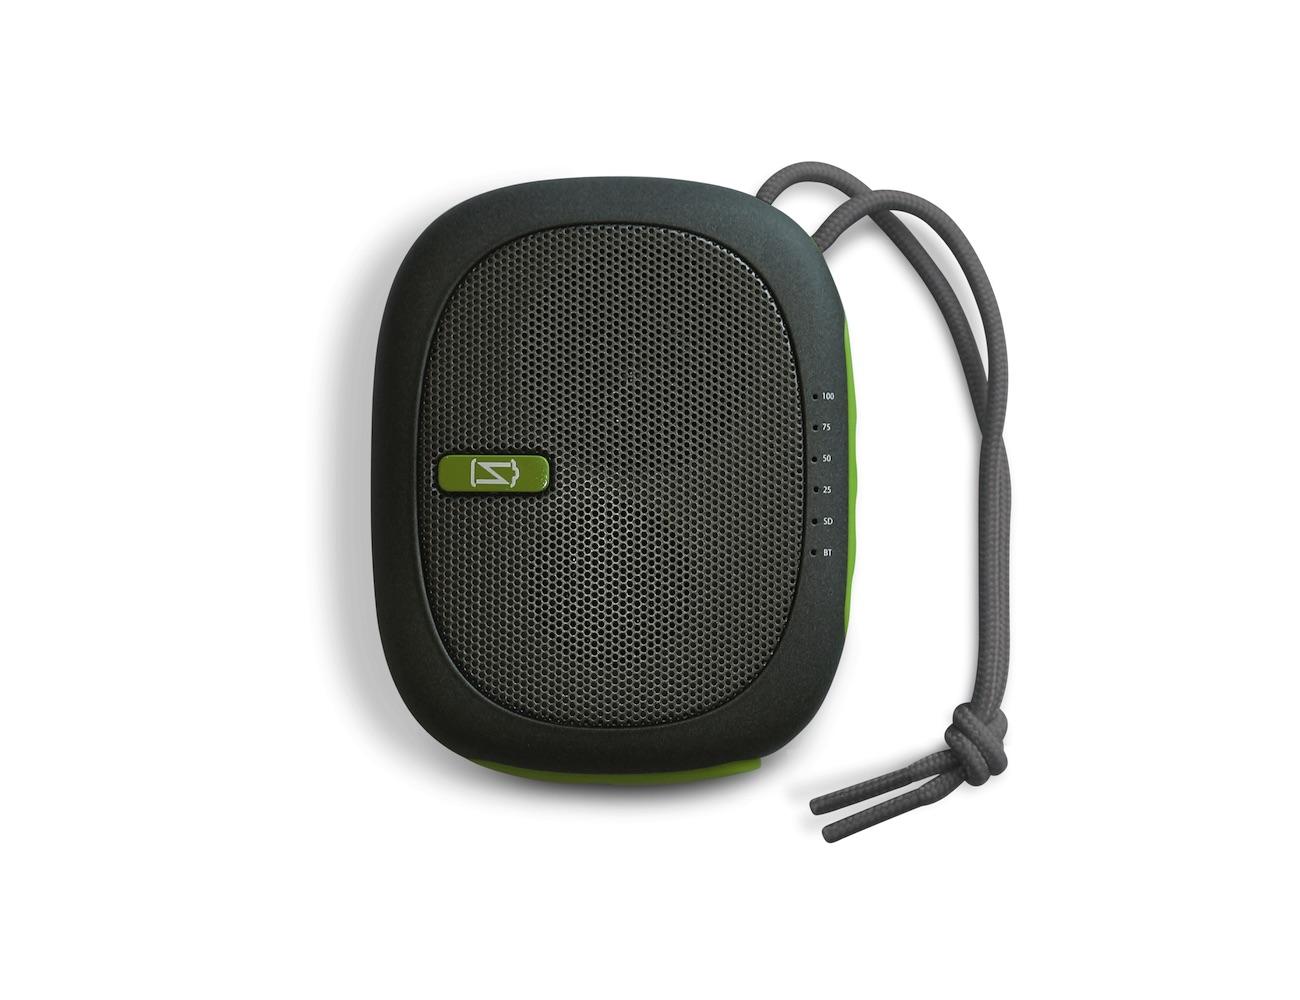 RiverFi Battery Speaker by VoltNow